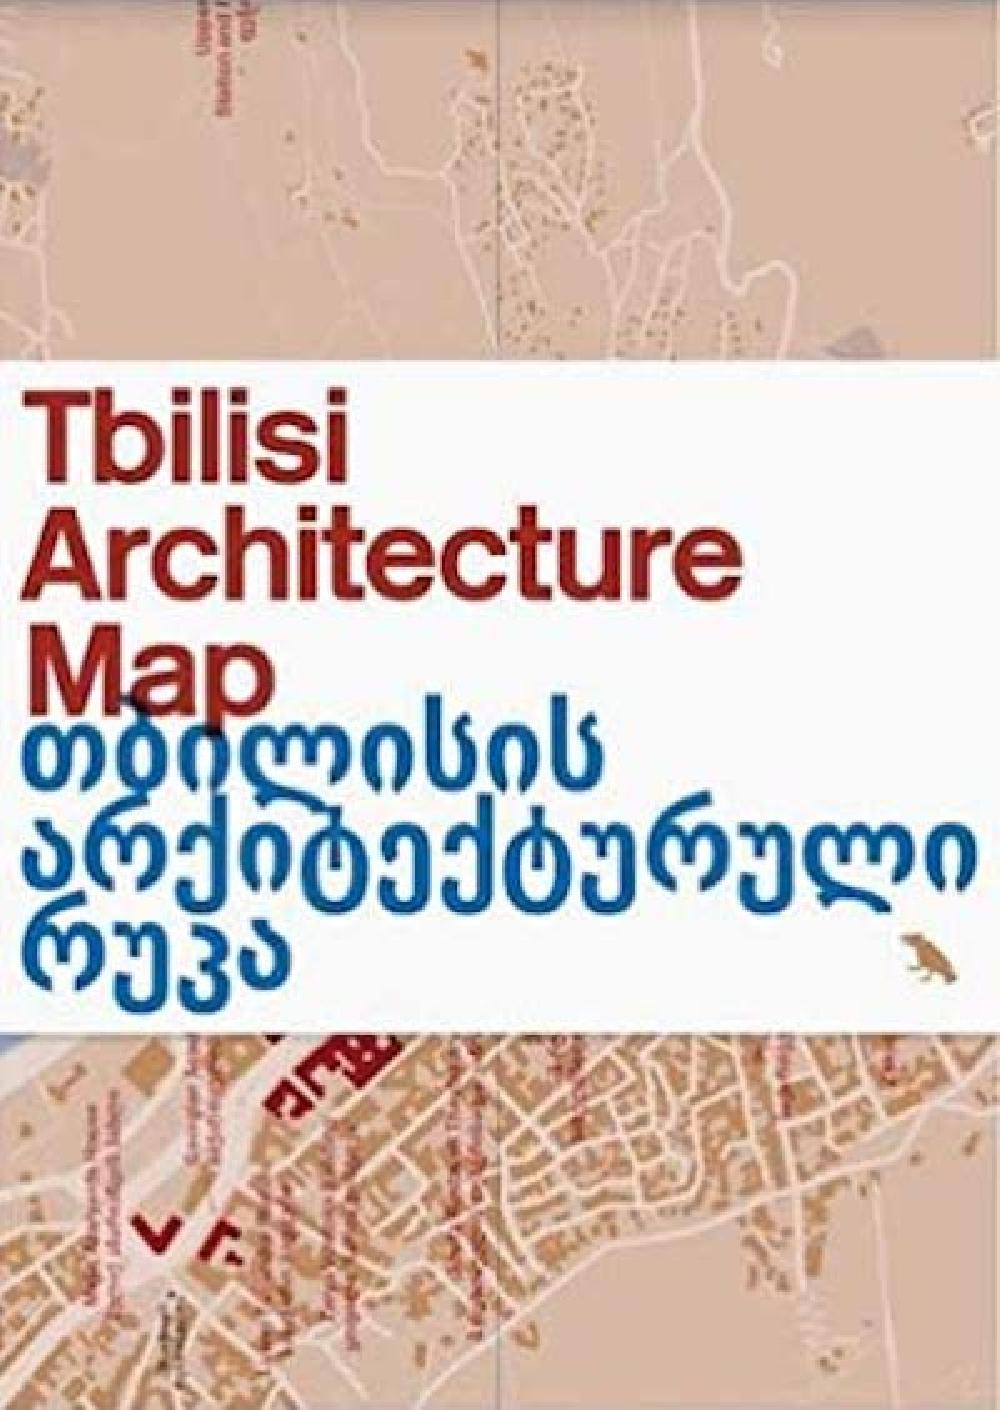 Tbilisi Architecture Map